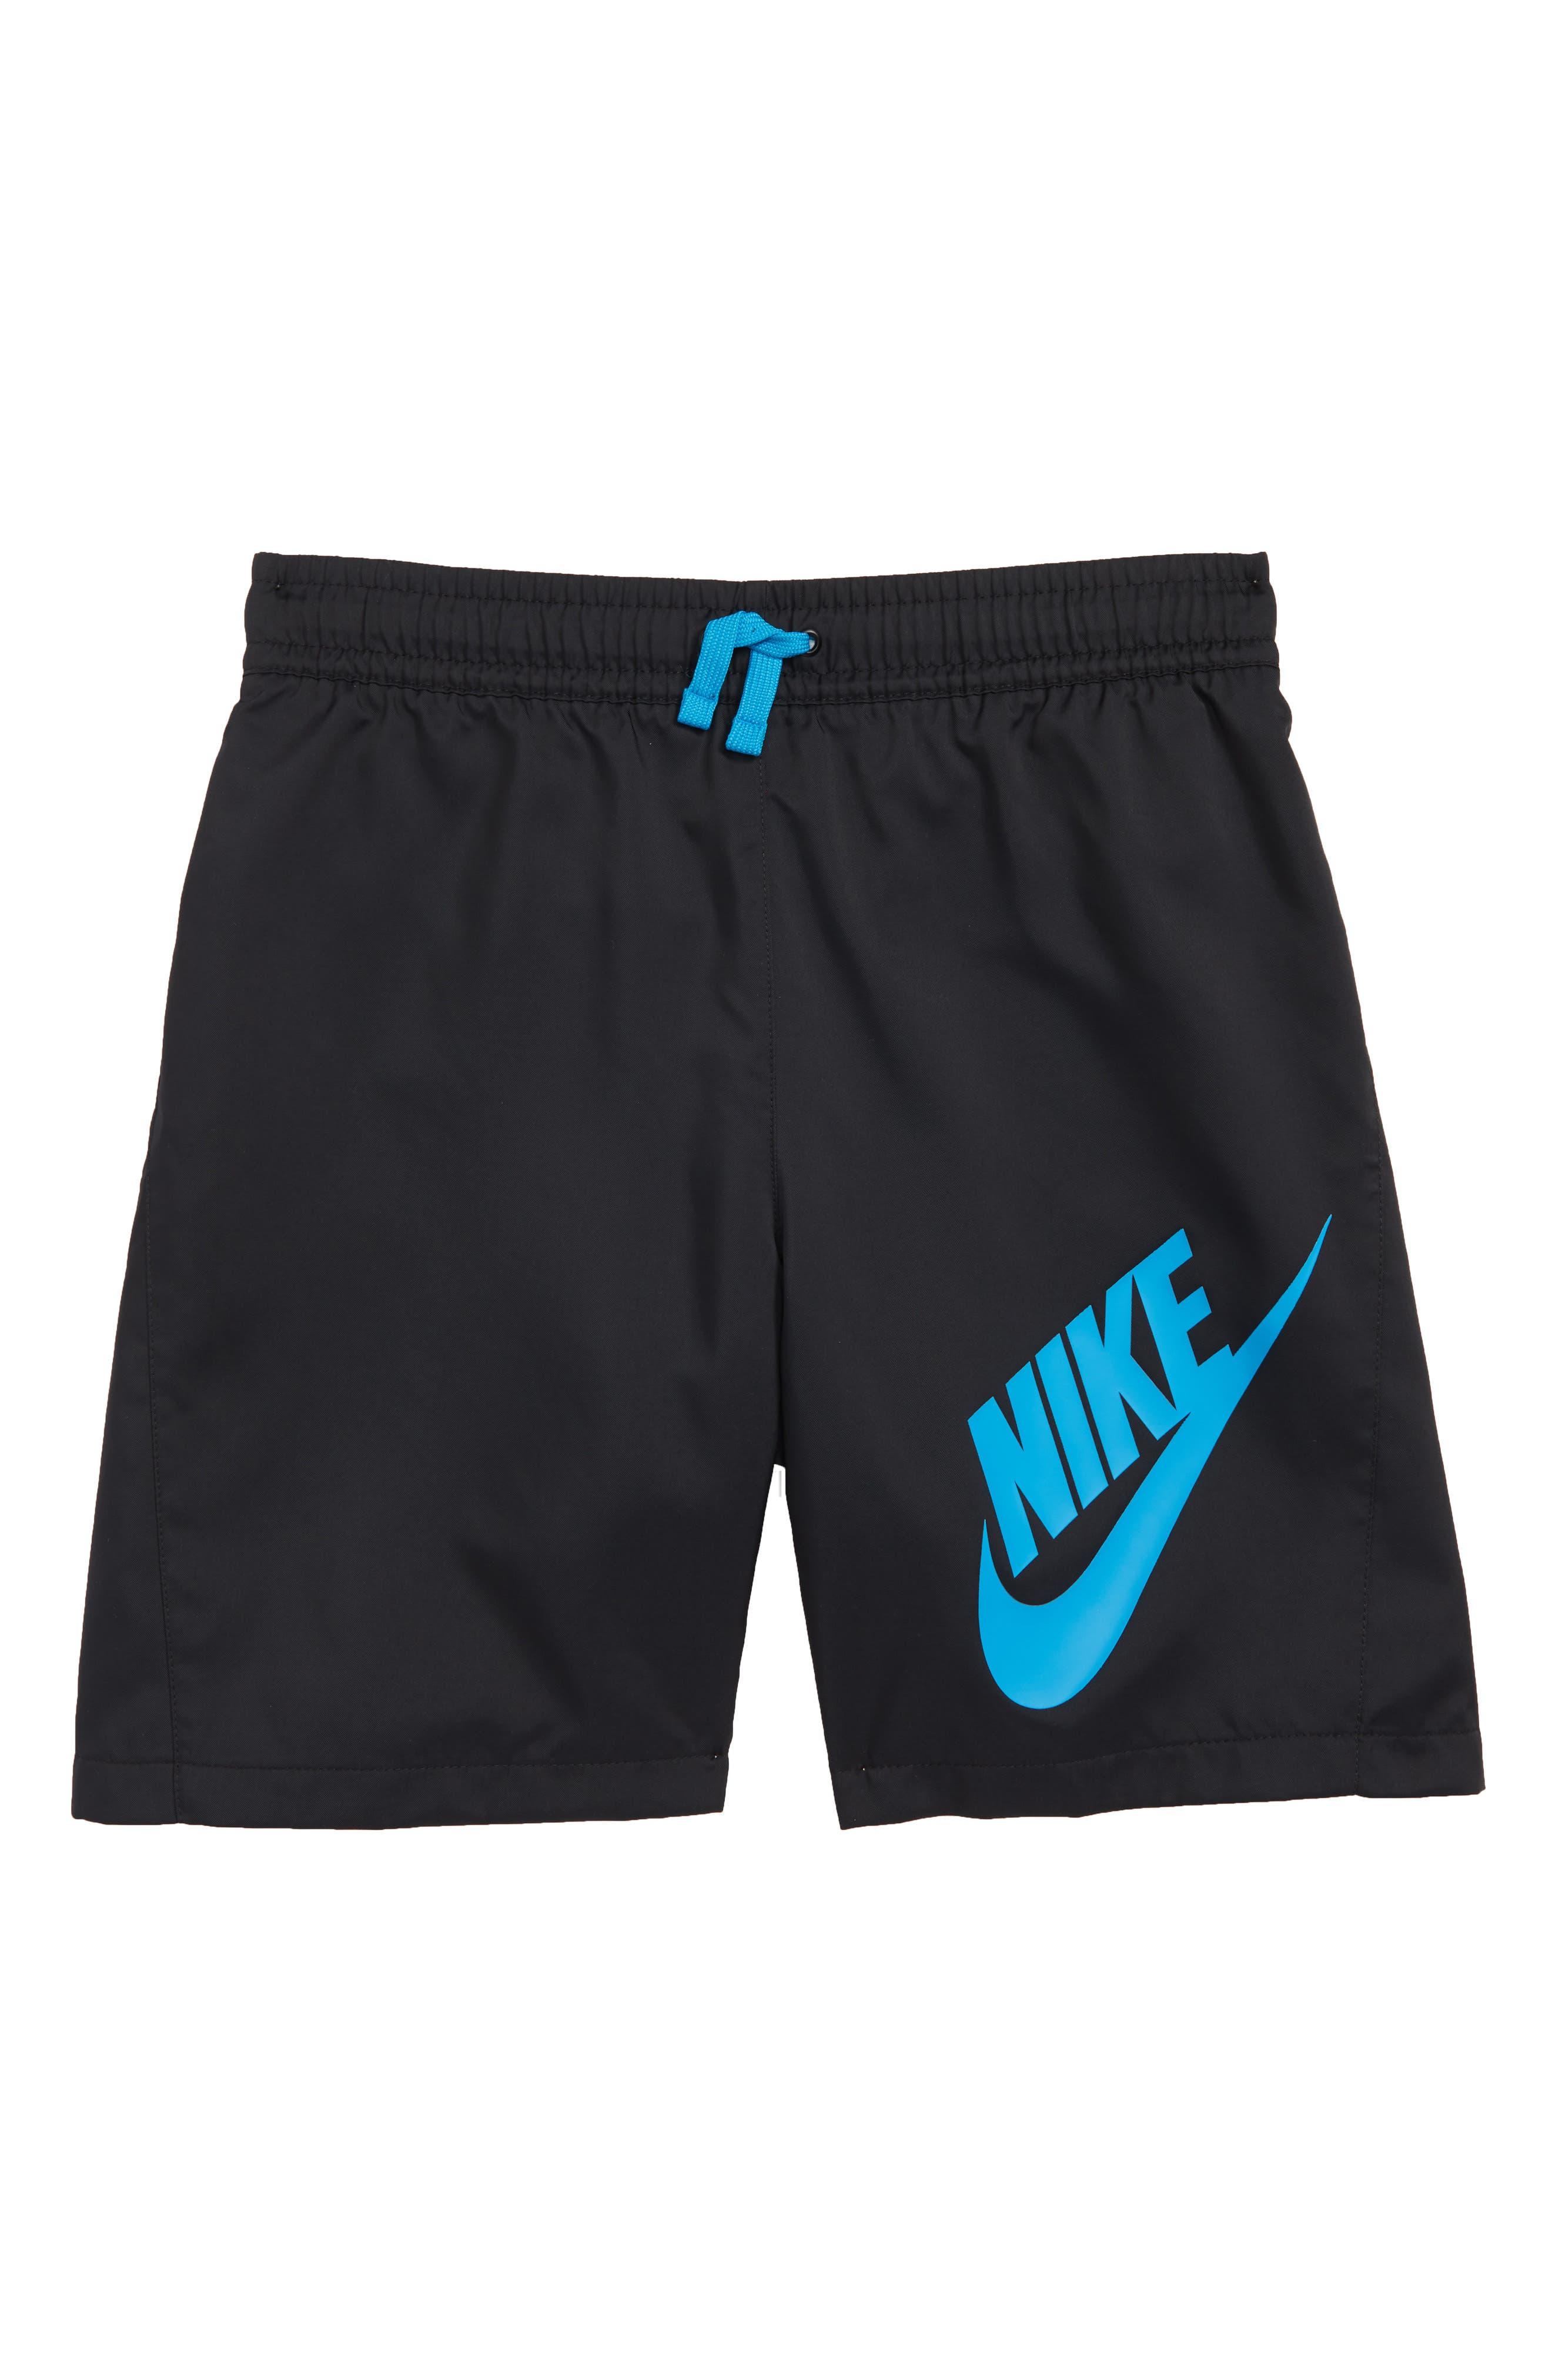 Woven Shorts,                         Main,                         color, 010